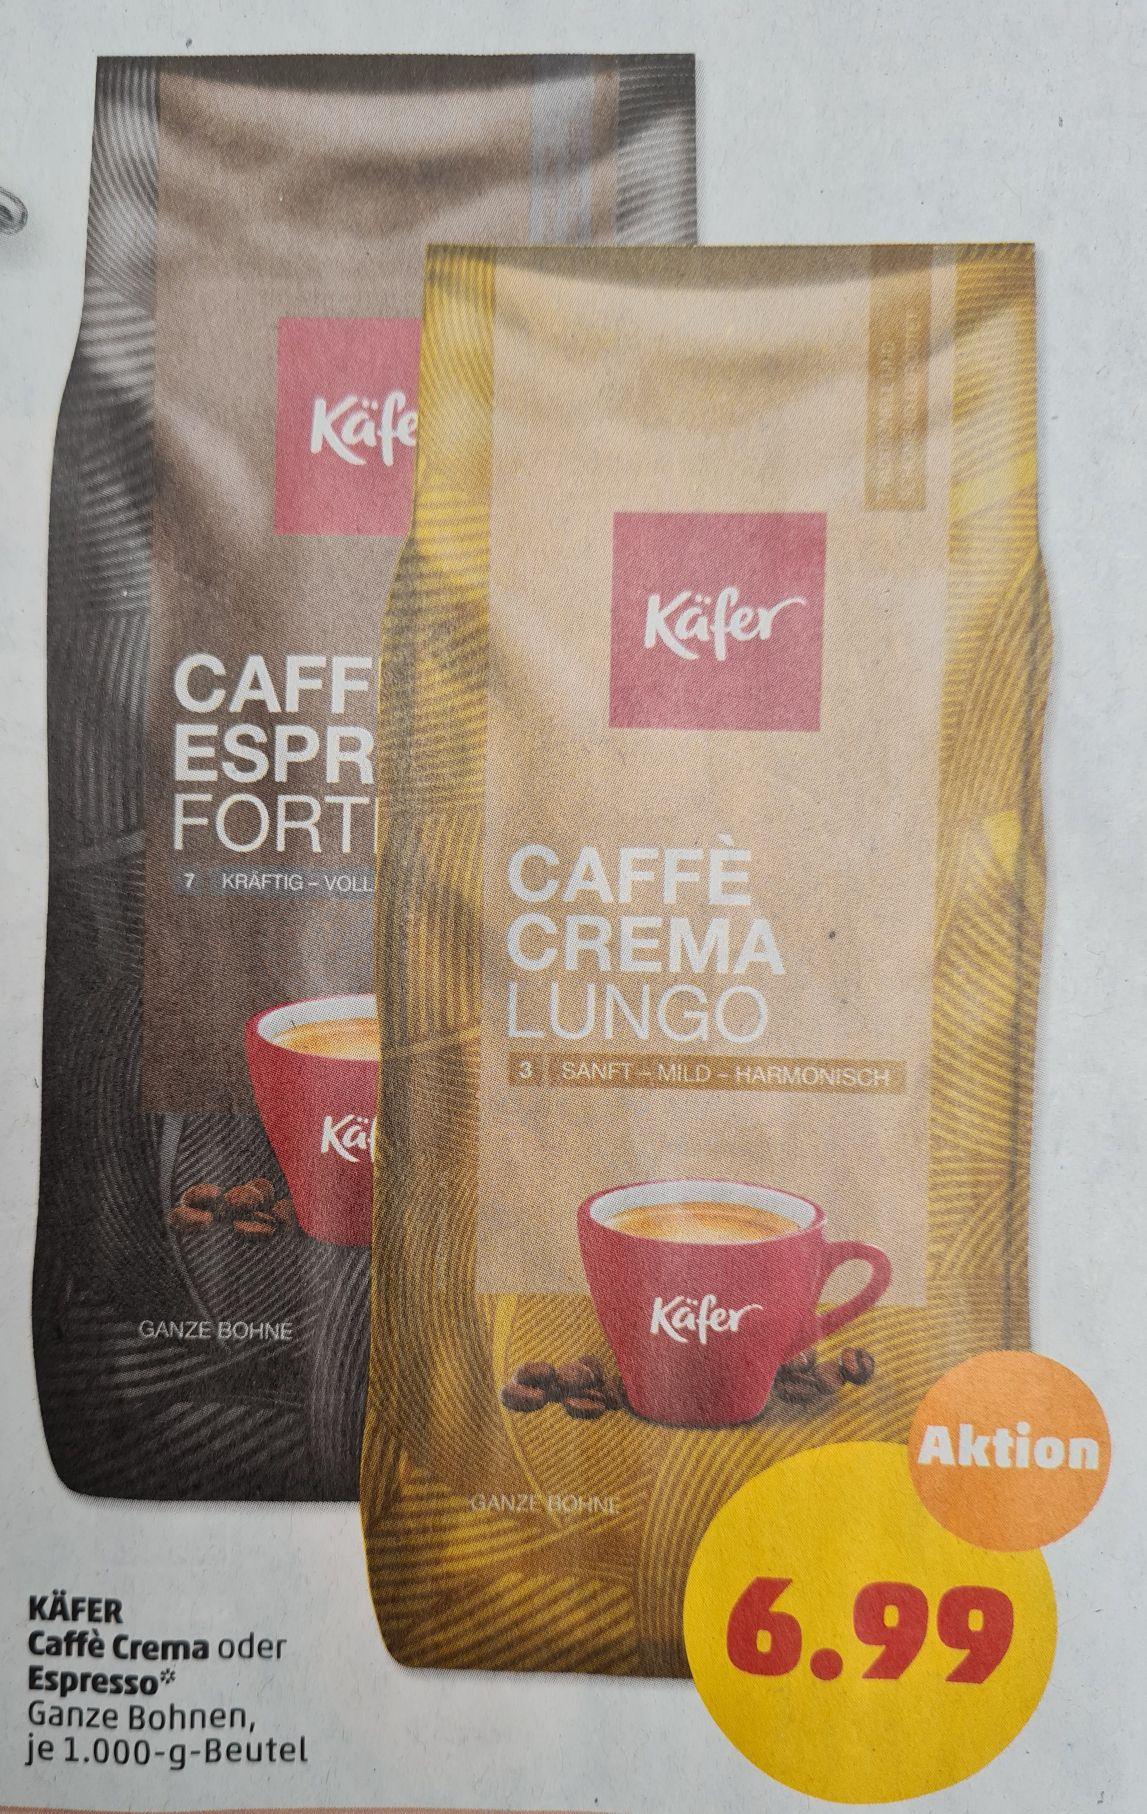 Käfer Caffé Crema oder Espresso Ganze Bohnen je 1000 g ab Mittwoch 12.05 Penny